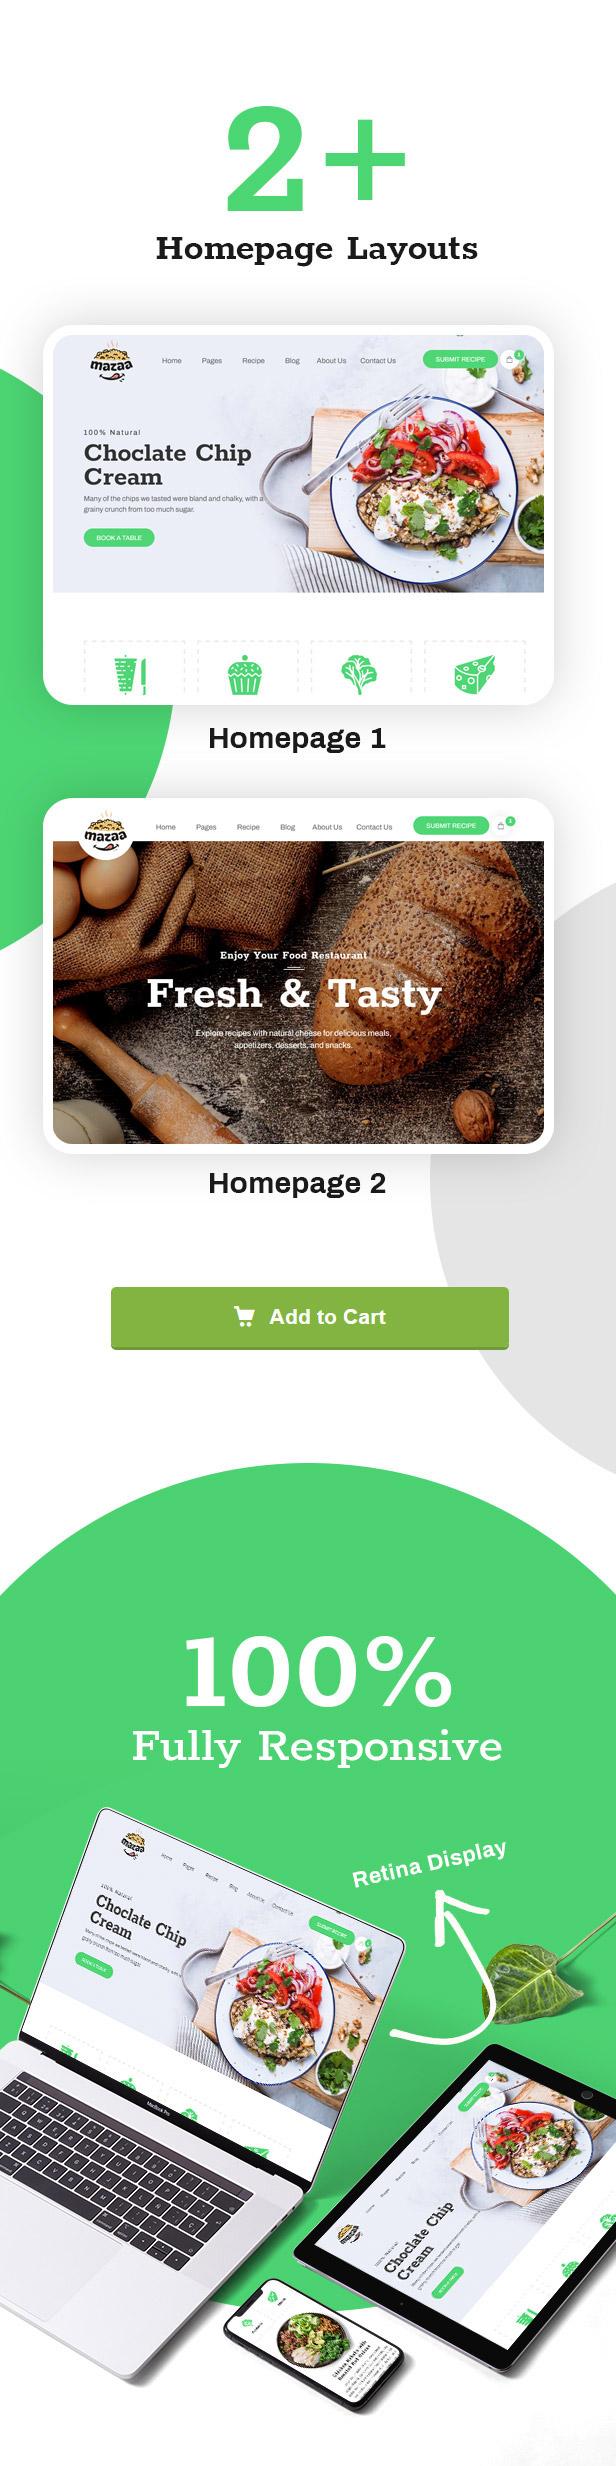 Mazaa - Responsive Restaurant or Eatery Template - 7